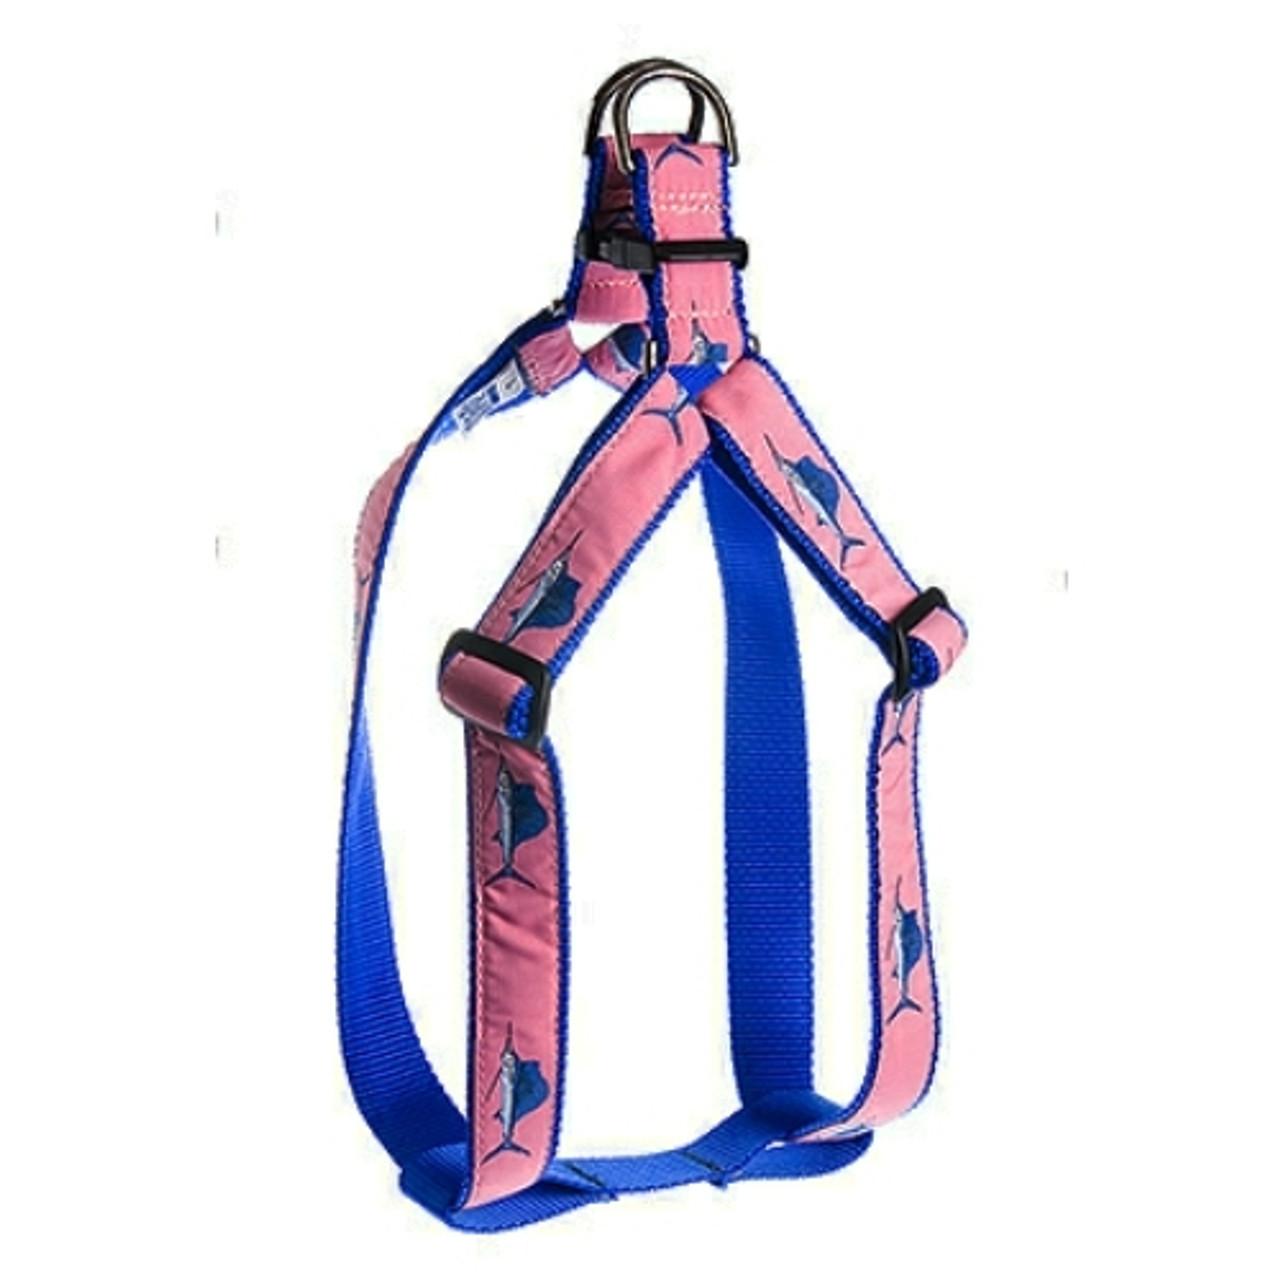 Fabric, Webbed, Bamboo & Ribbon Dog Harnesses